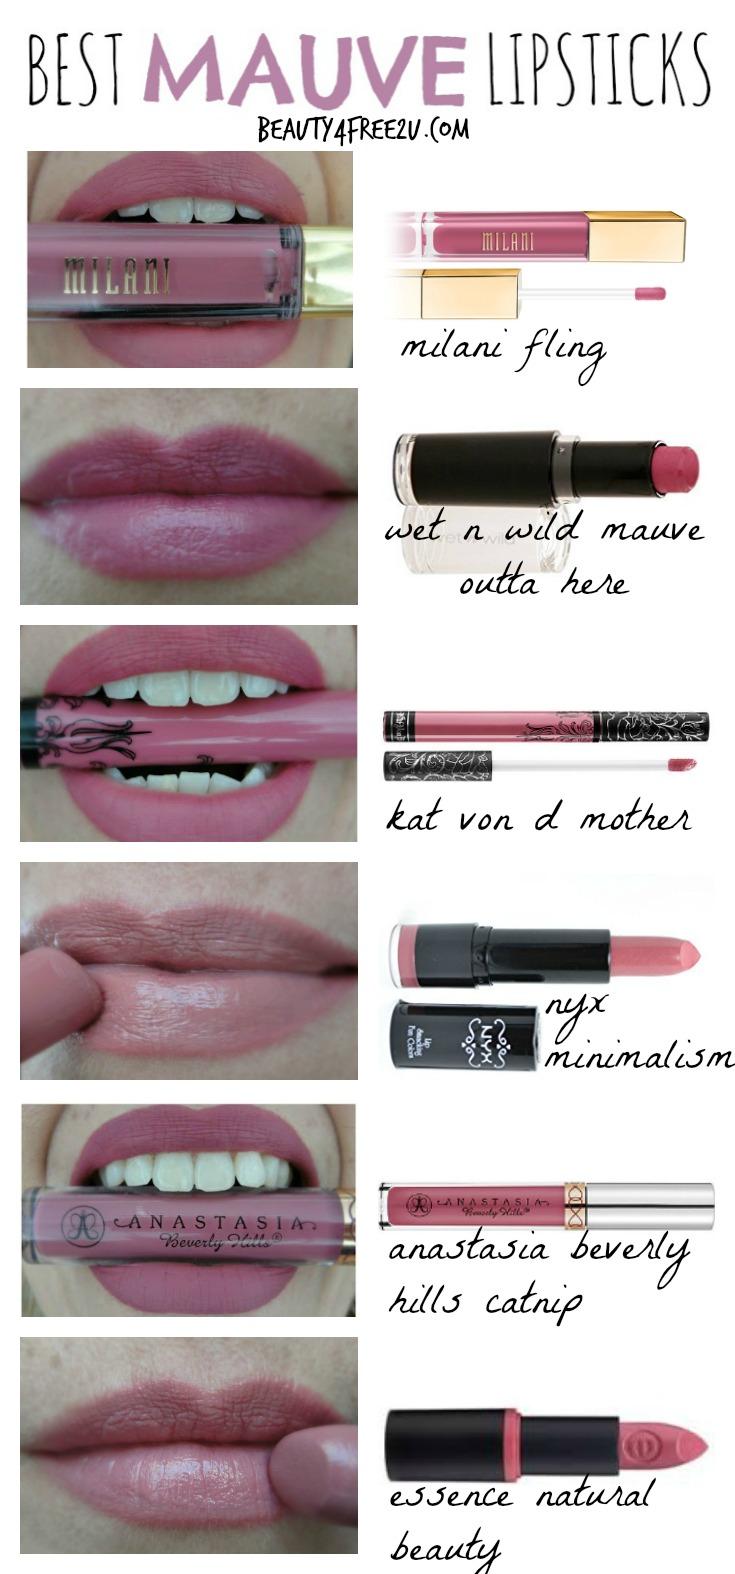 Best Mauve Lipsticks-4505